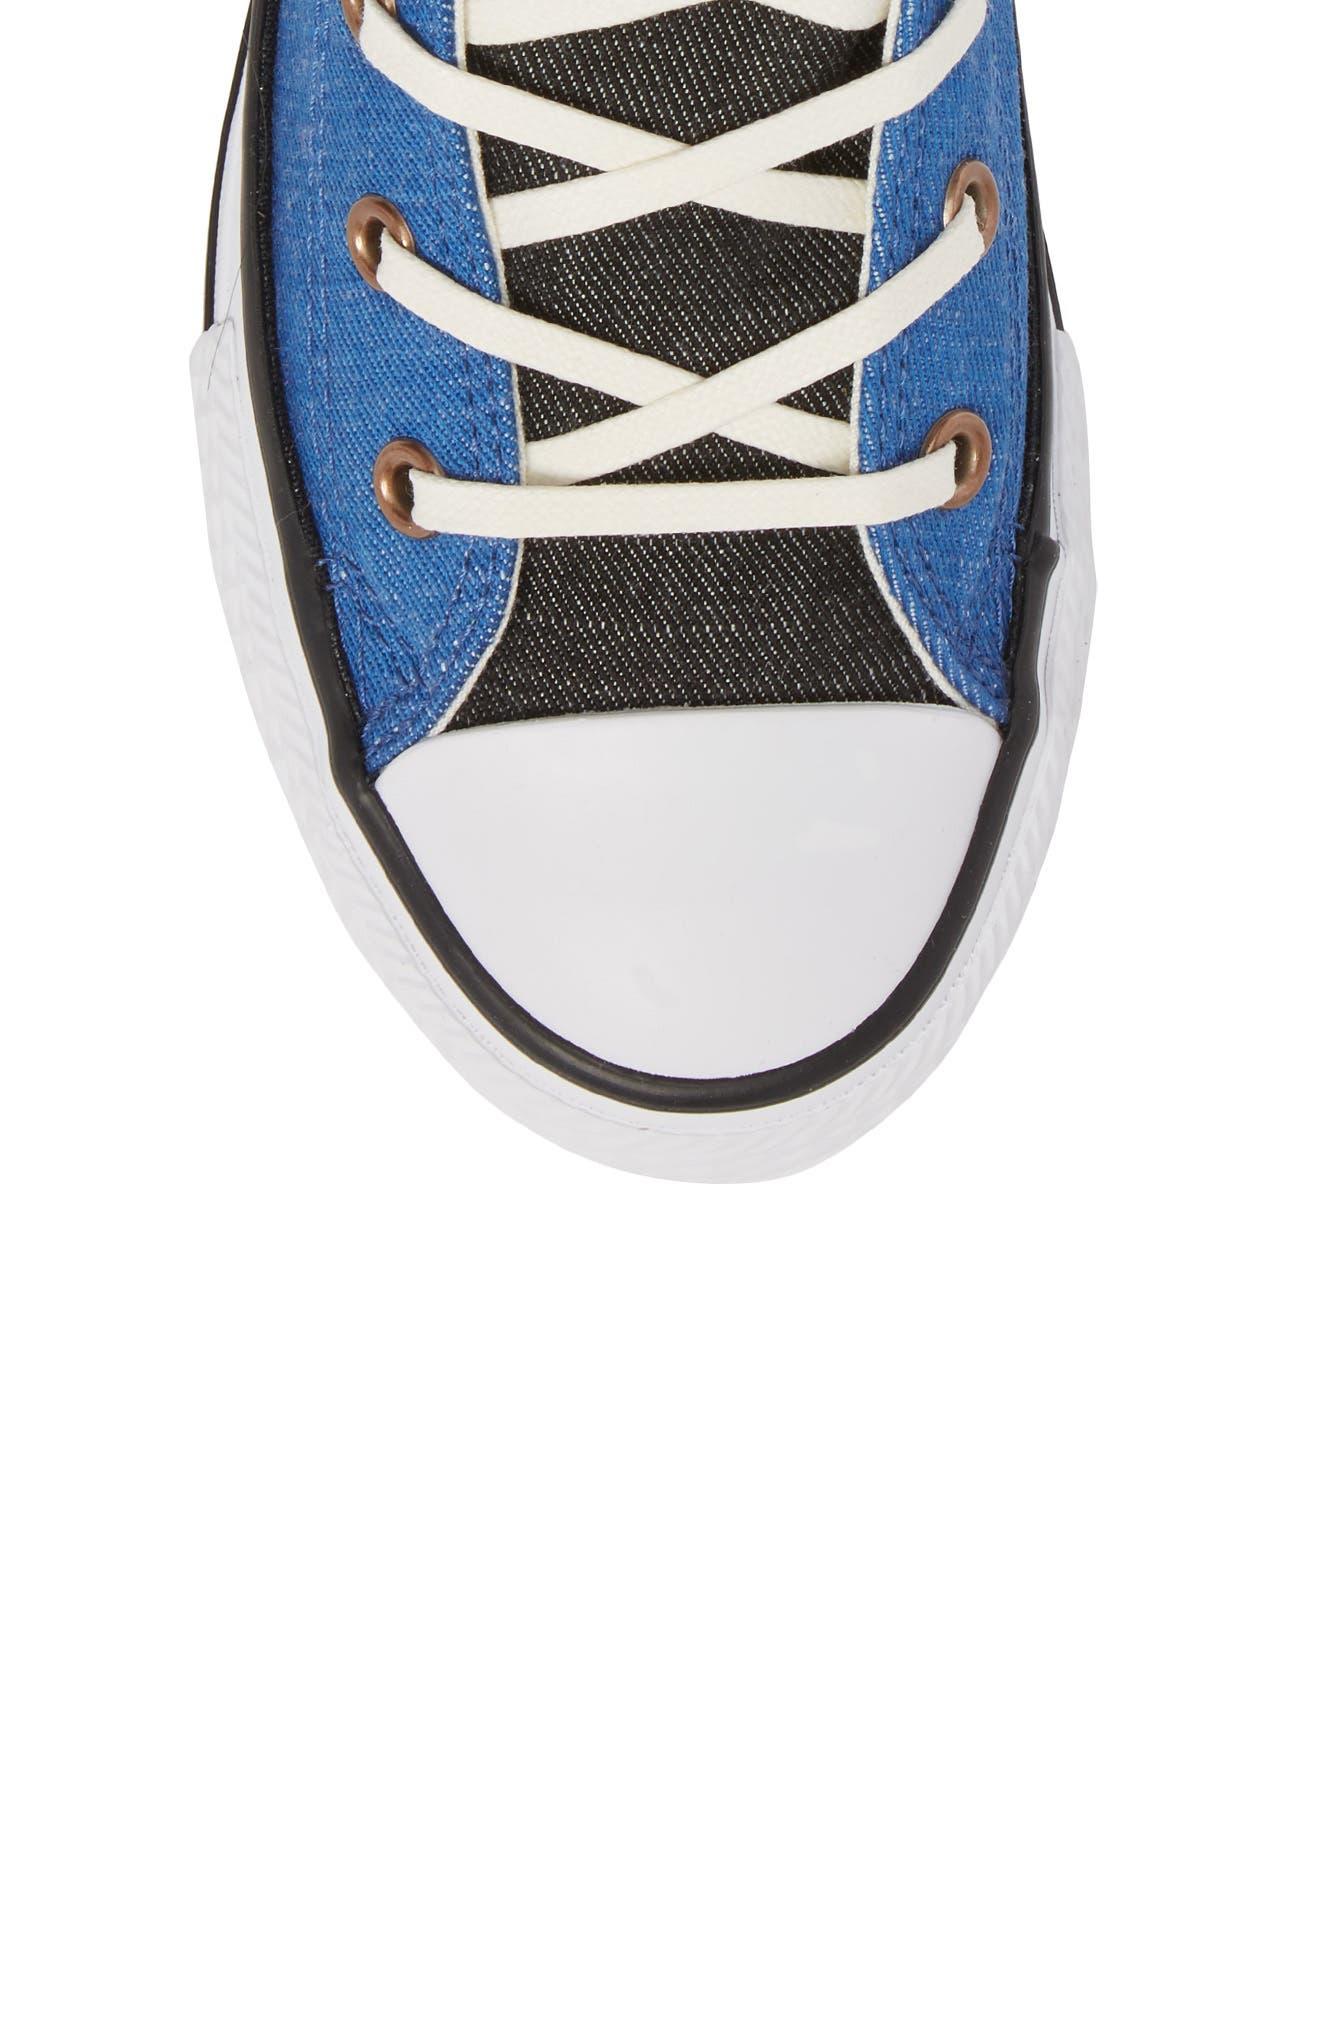 Chuck Taylor<sup>®</sup> All Star<sup>®</sup> Chambray High Top Sneaker,                             Alternate thumbnail 5, color,                             Nightfall Blue